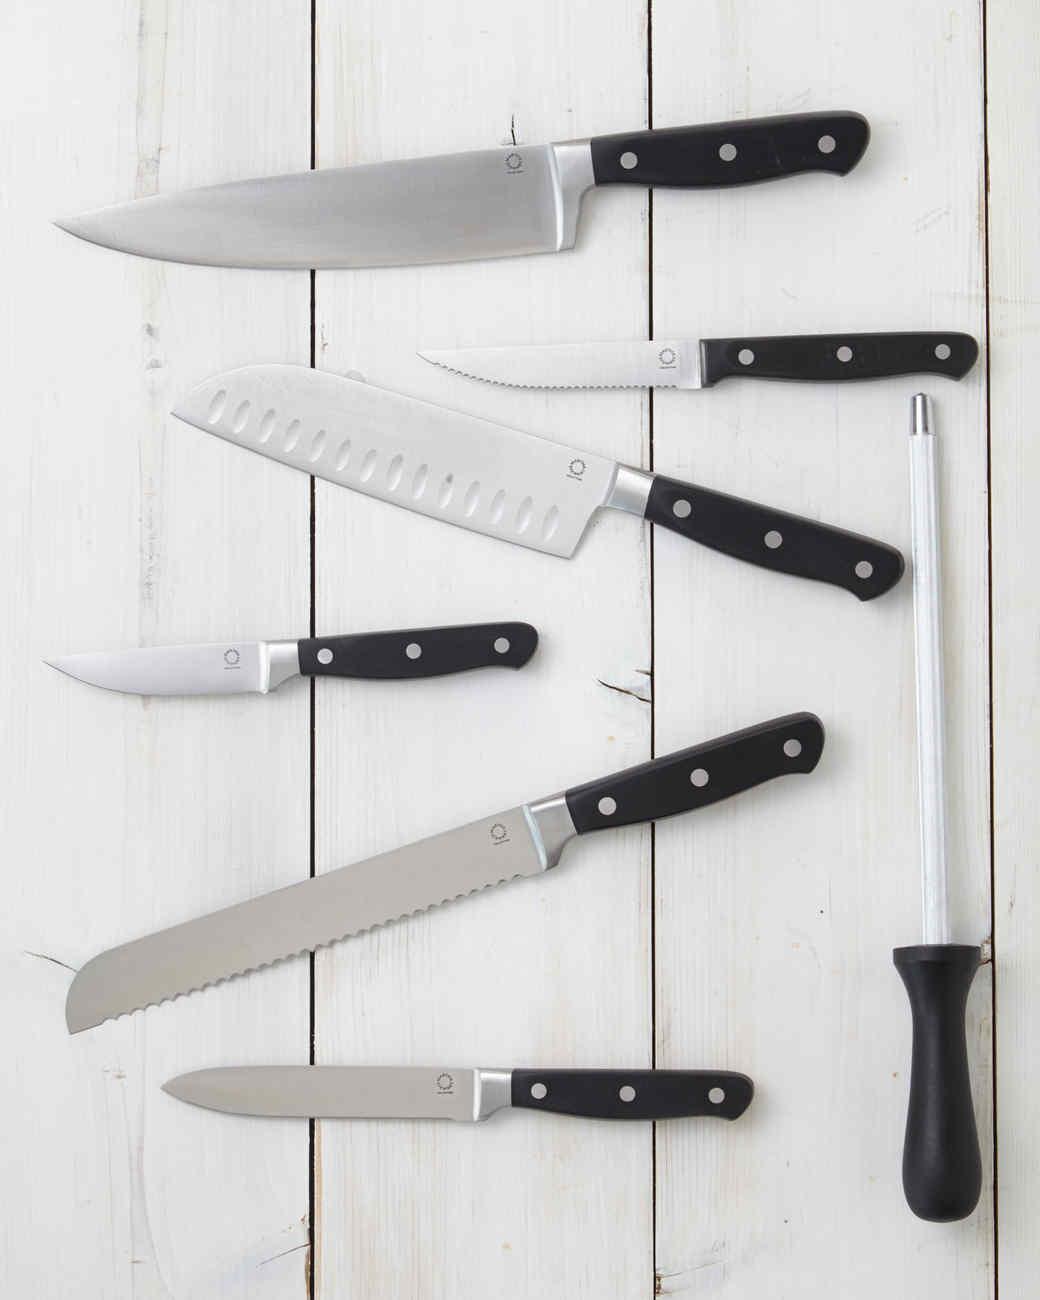 macys-knives-group-web-0541-d112231-0515.jpg